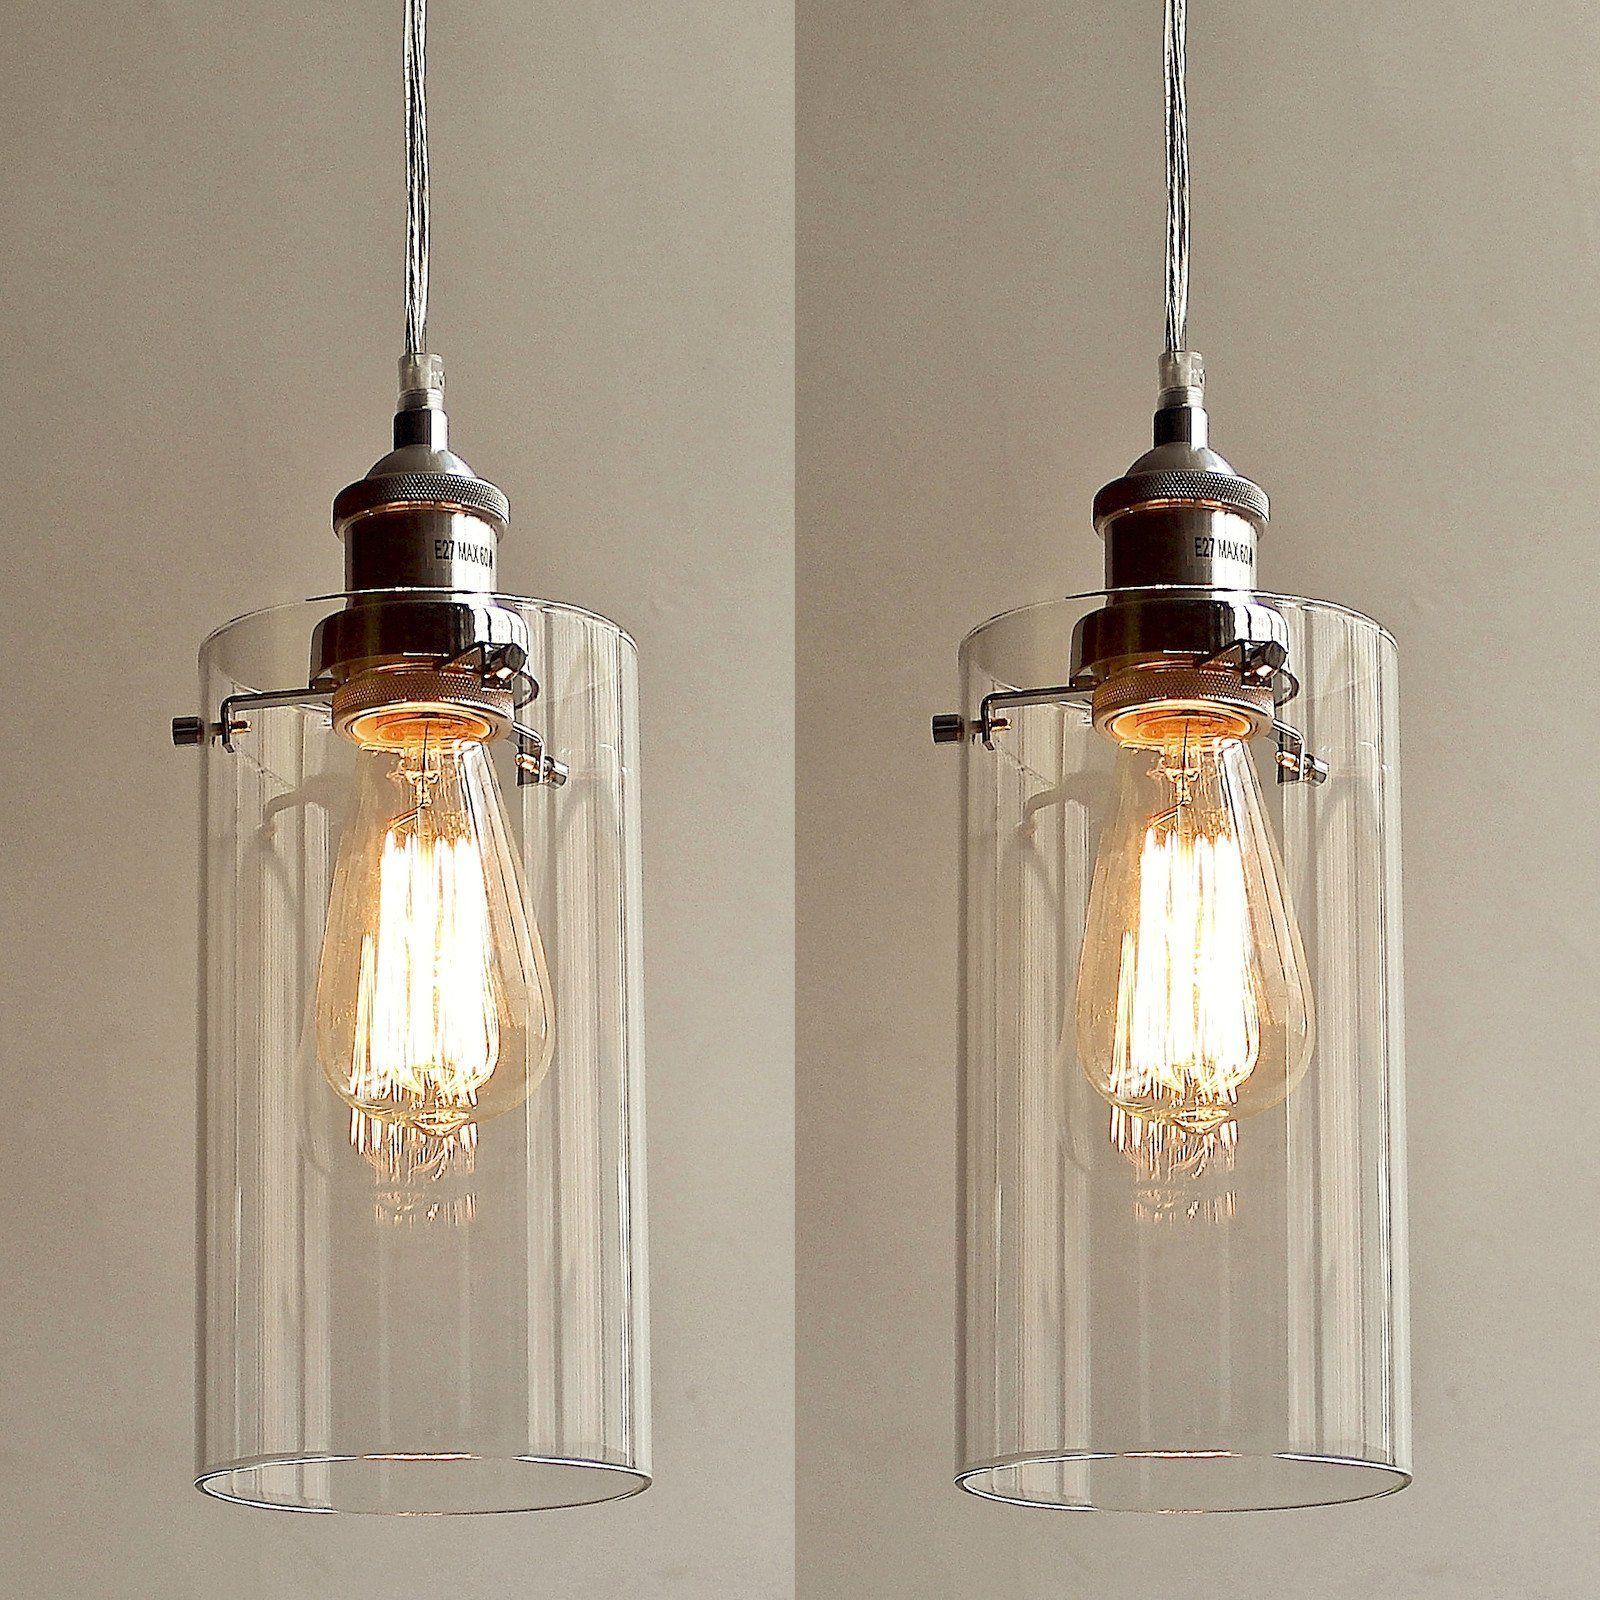 2pc allira pendant lights clear glass chrome fittings